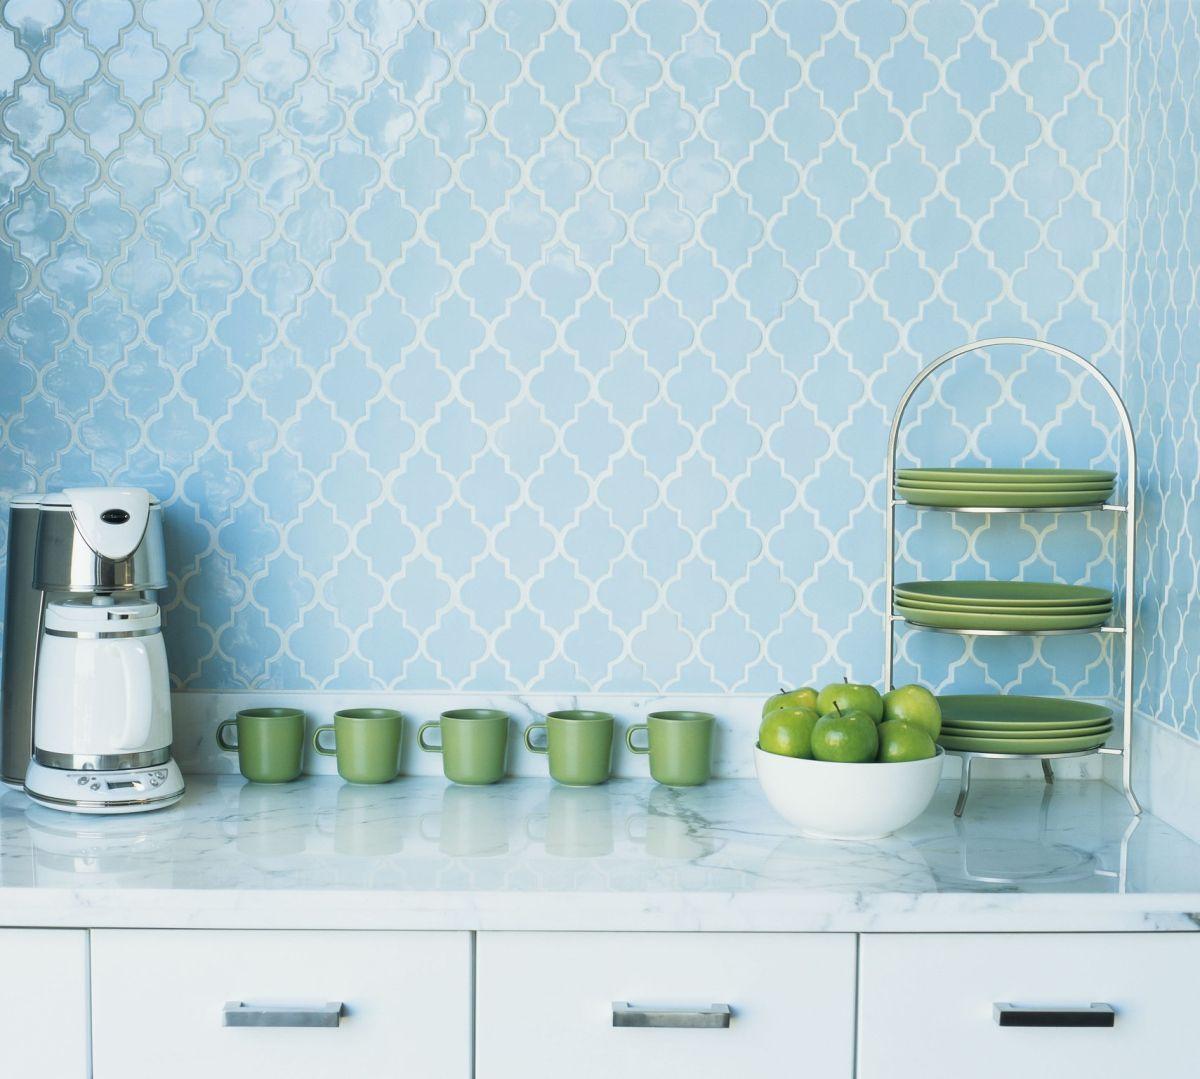 Голубая фигурная плитка на кухне